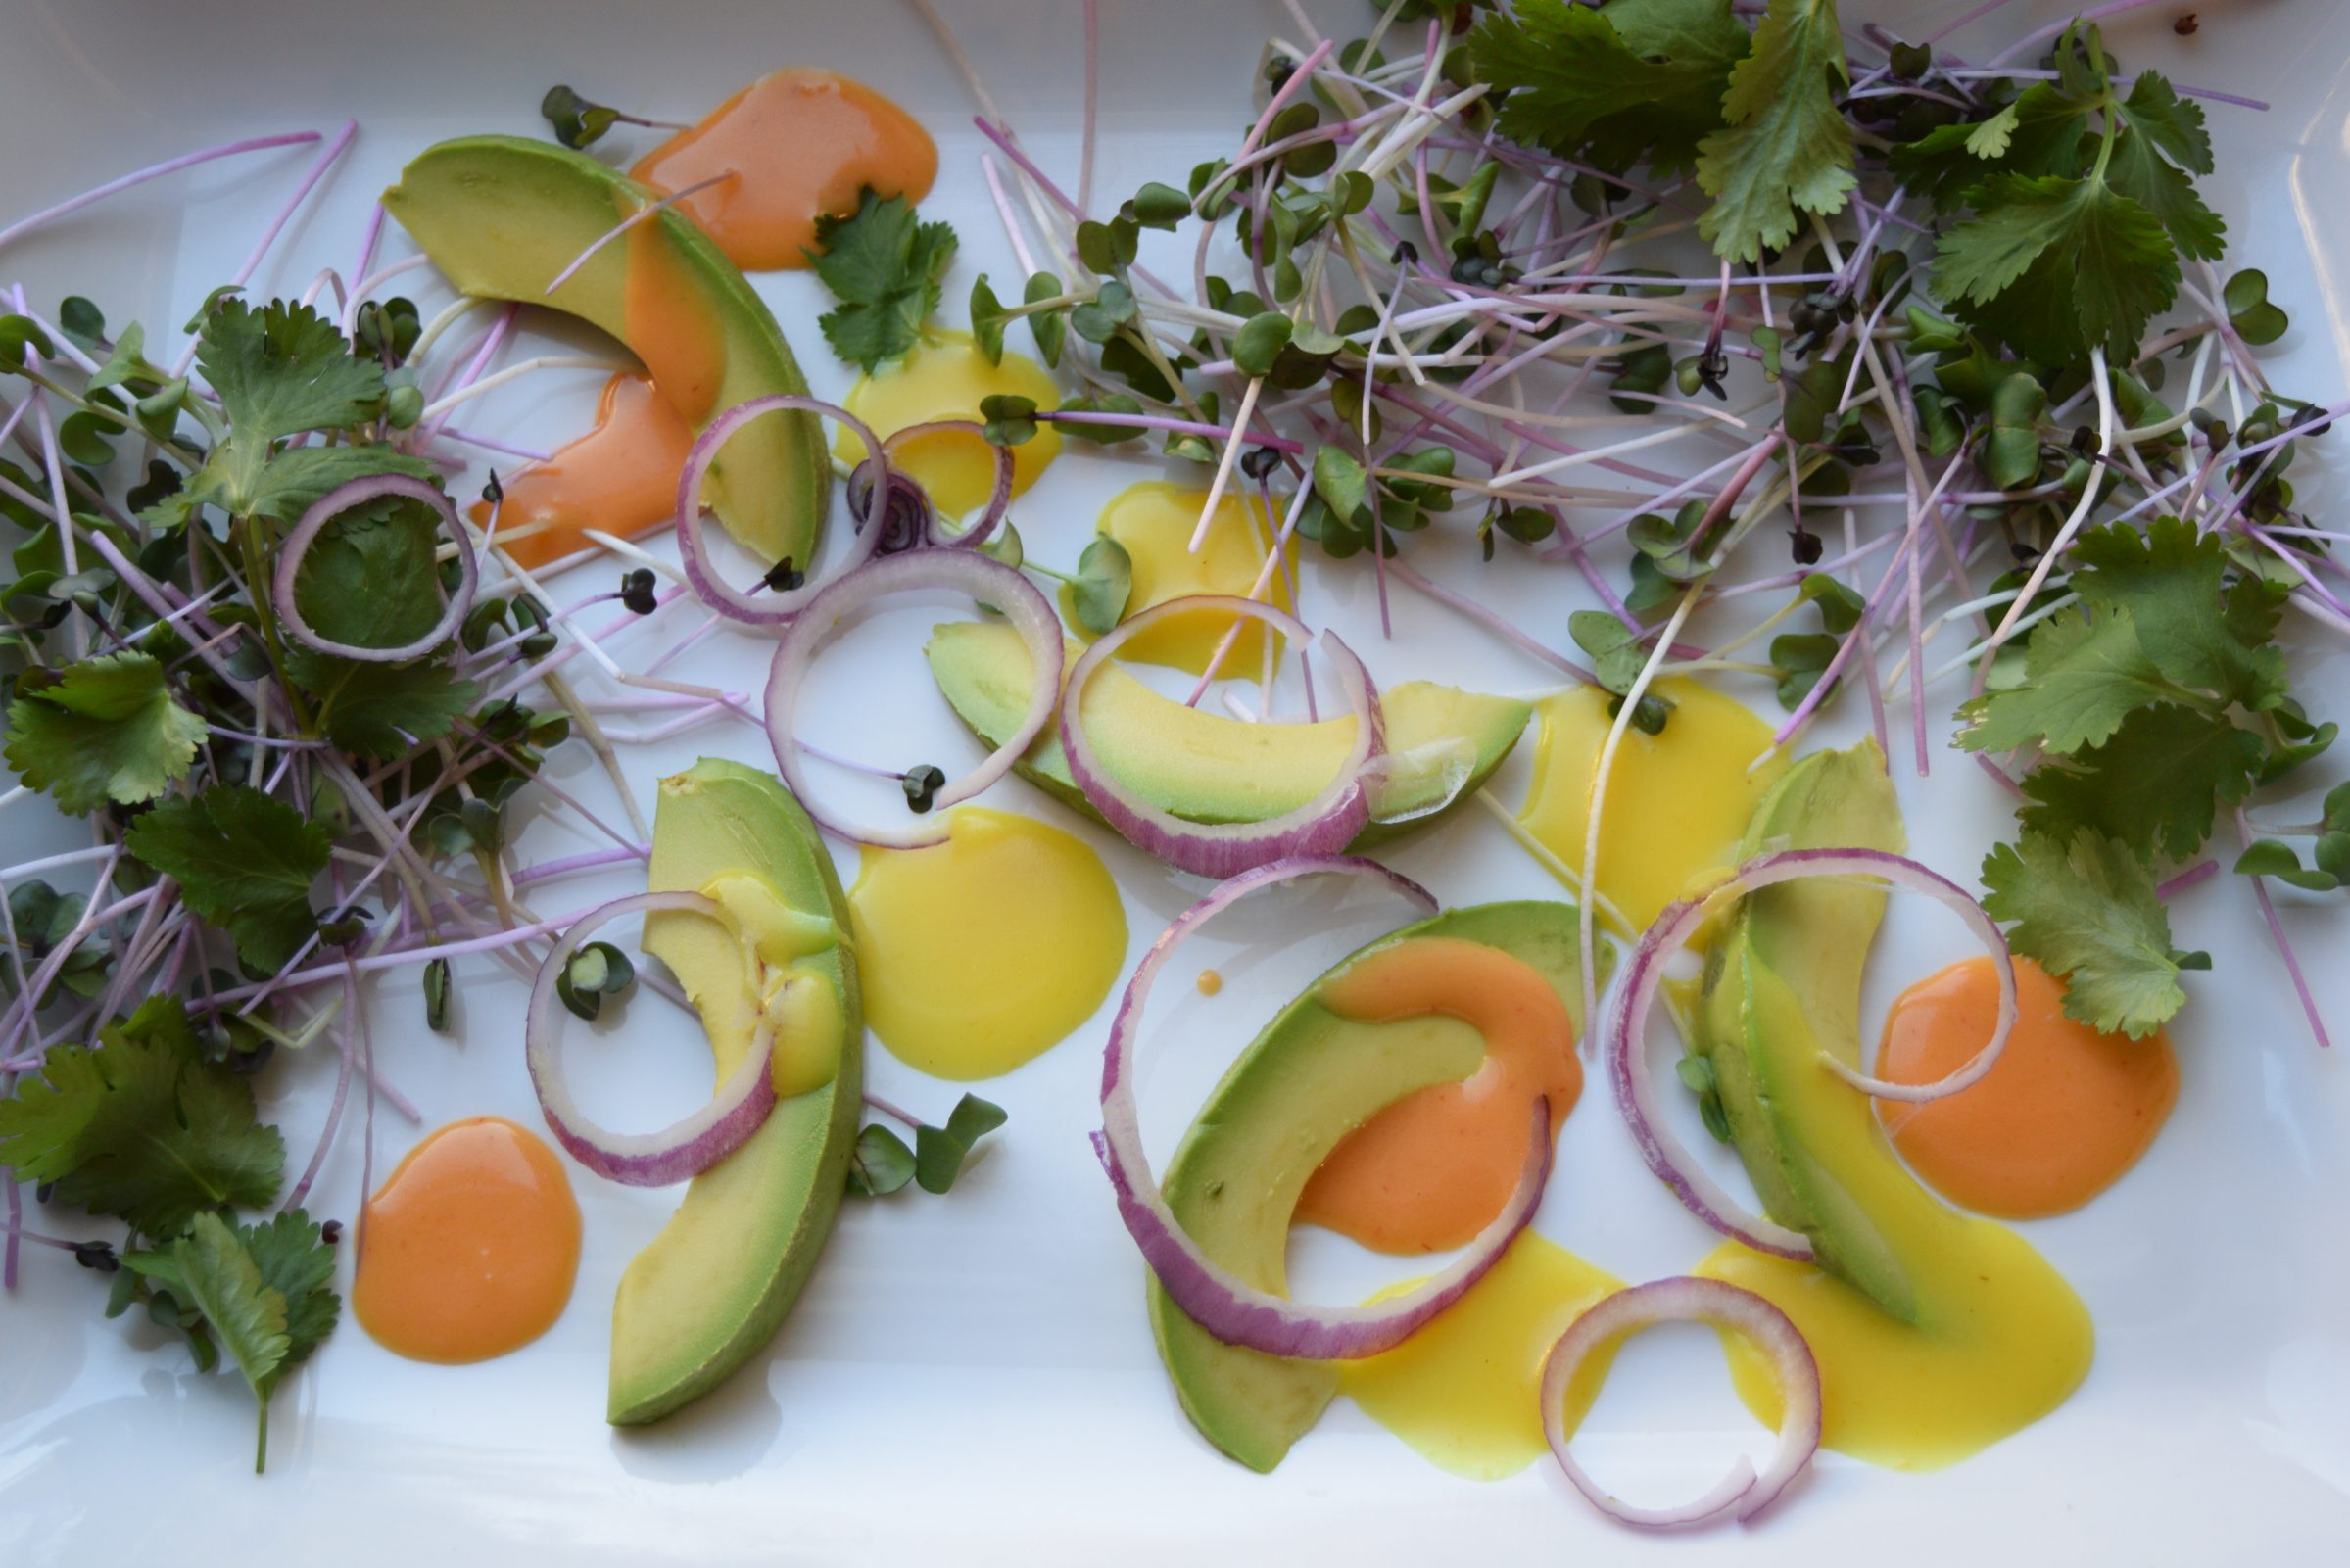 Avocados, sprouts, and orange sriracha salad dressing